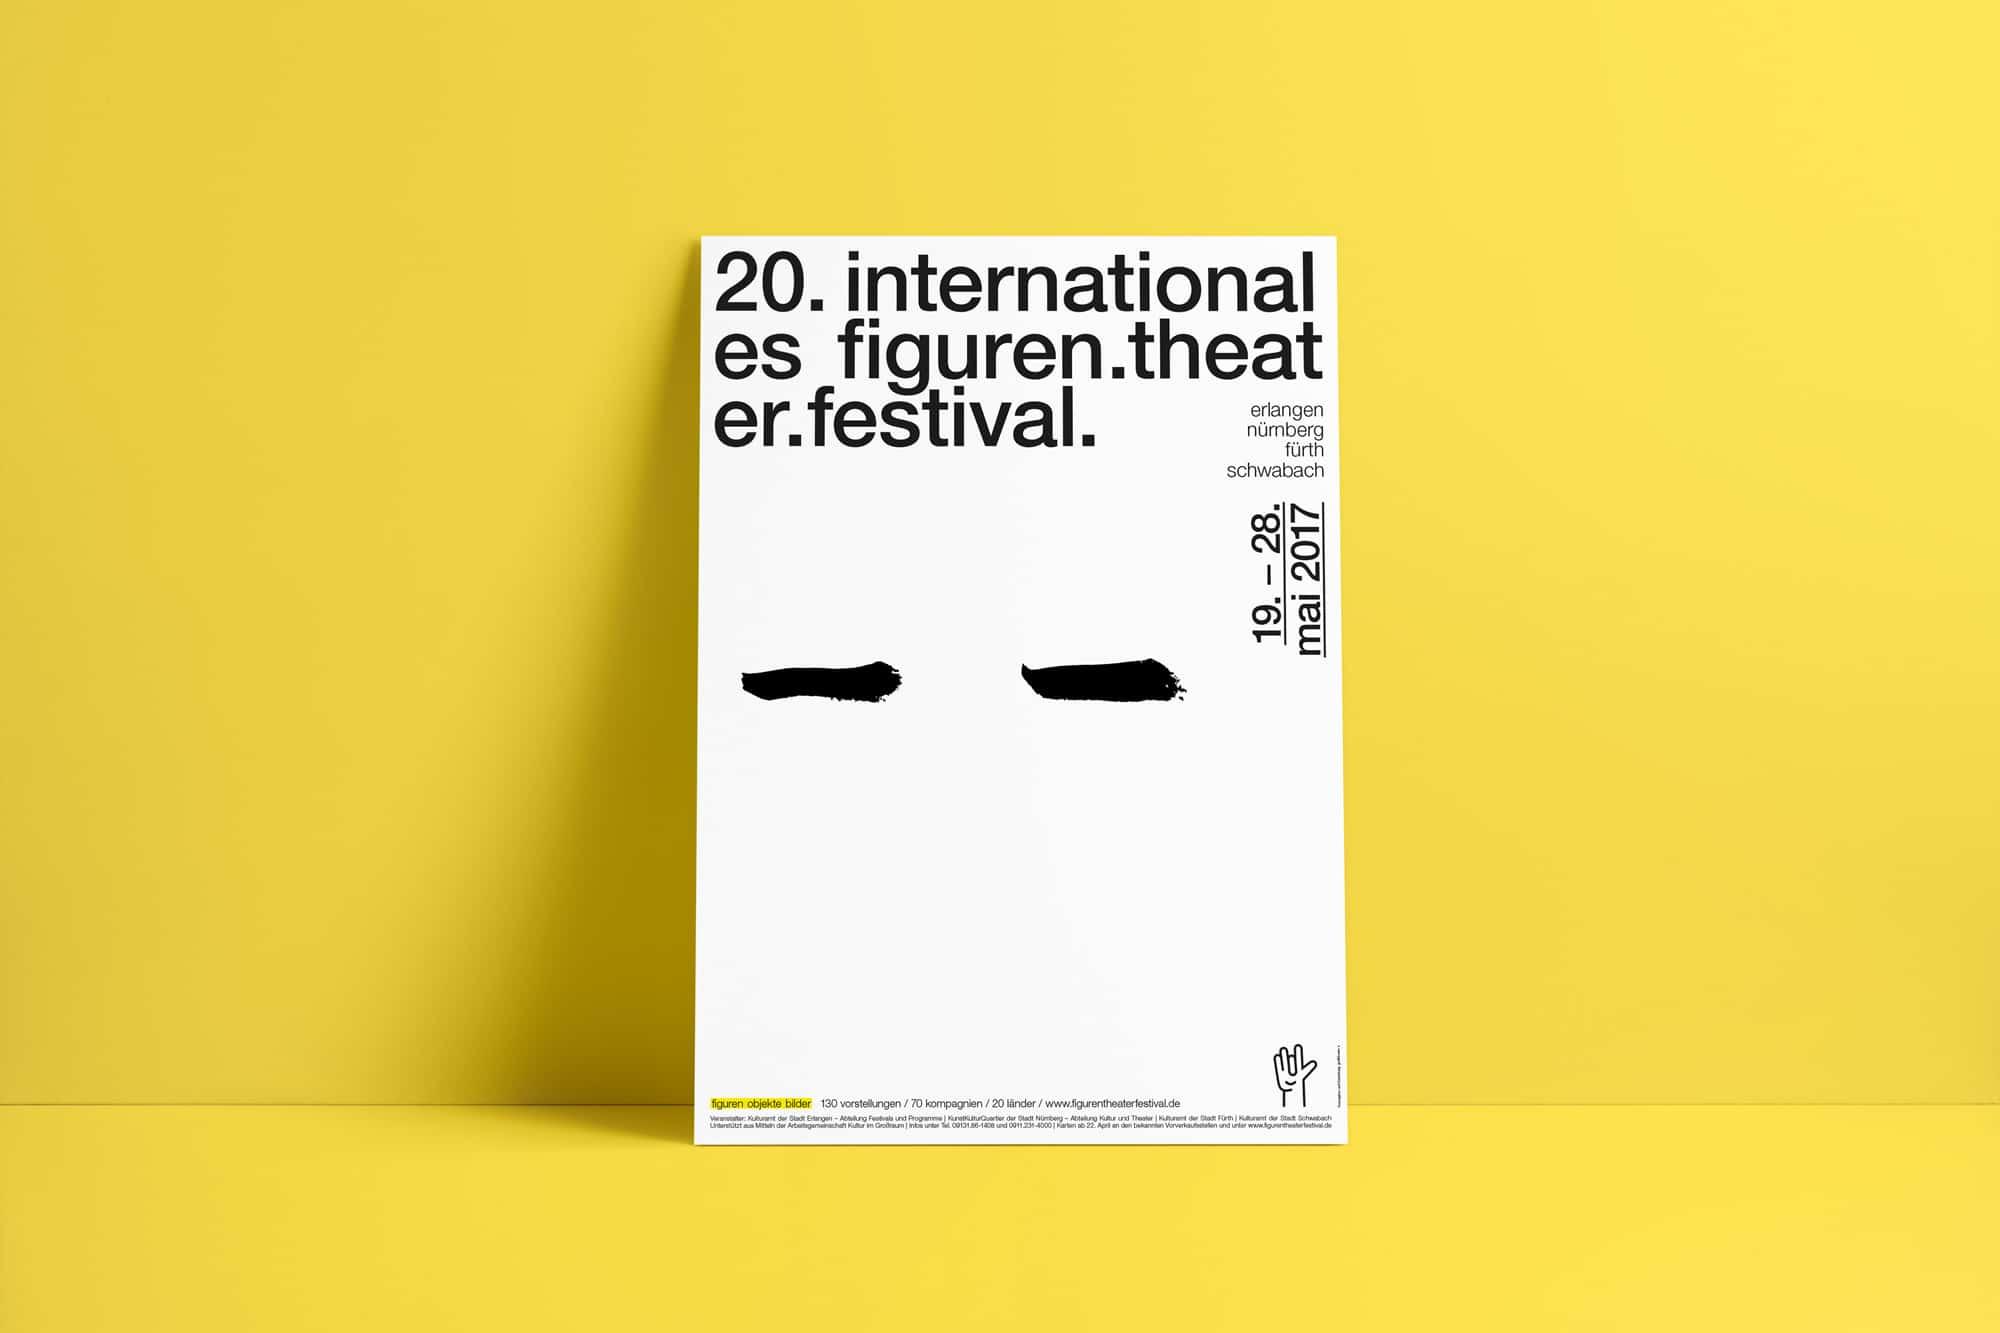 planx-internationales.figuren.theater.festival-2017-Plakate-06